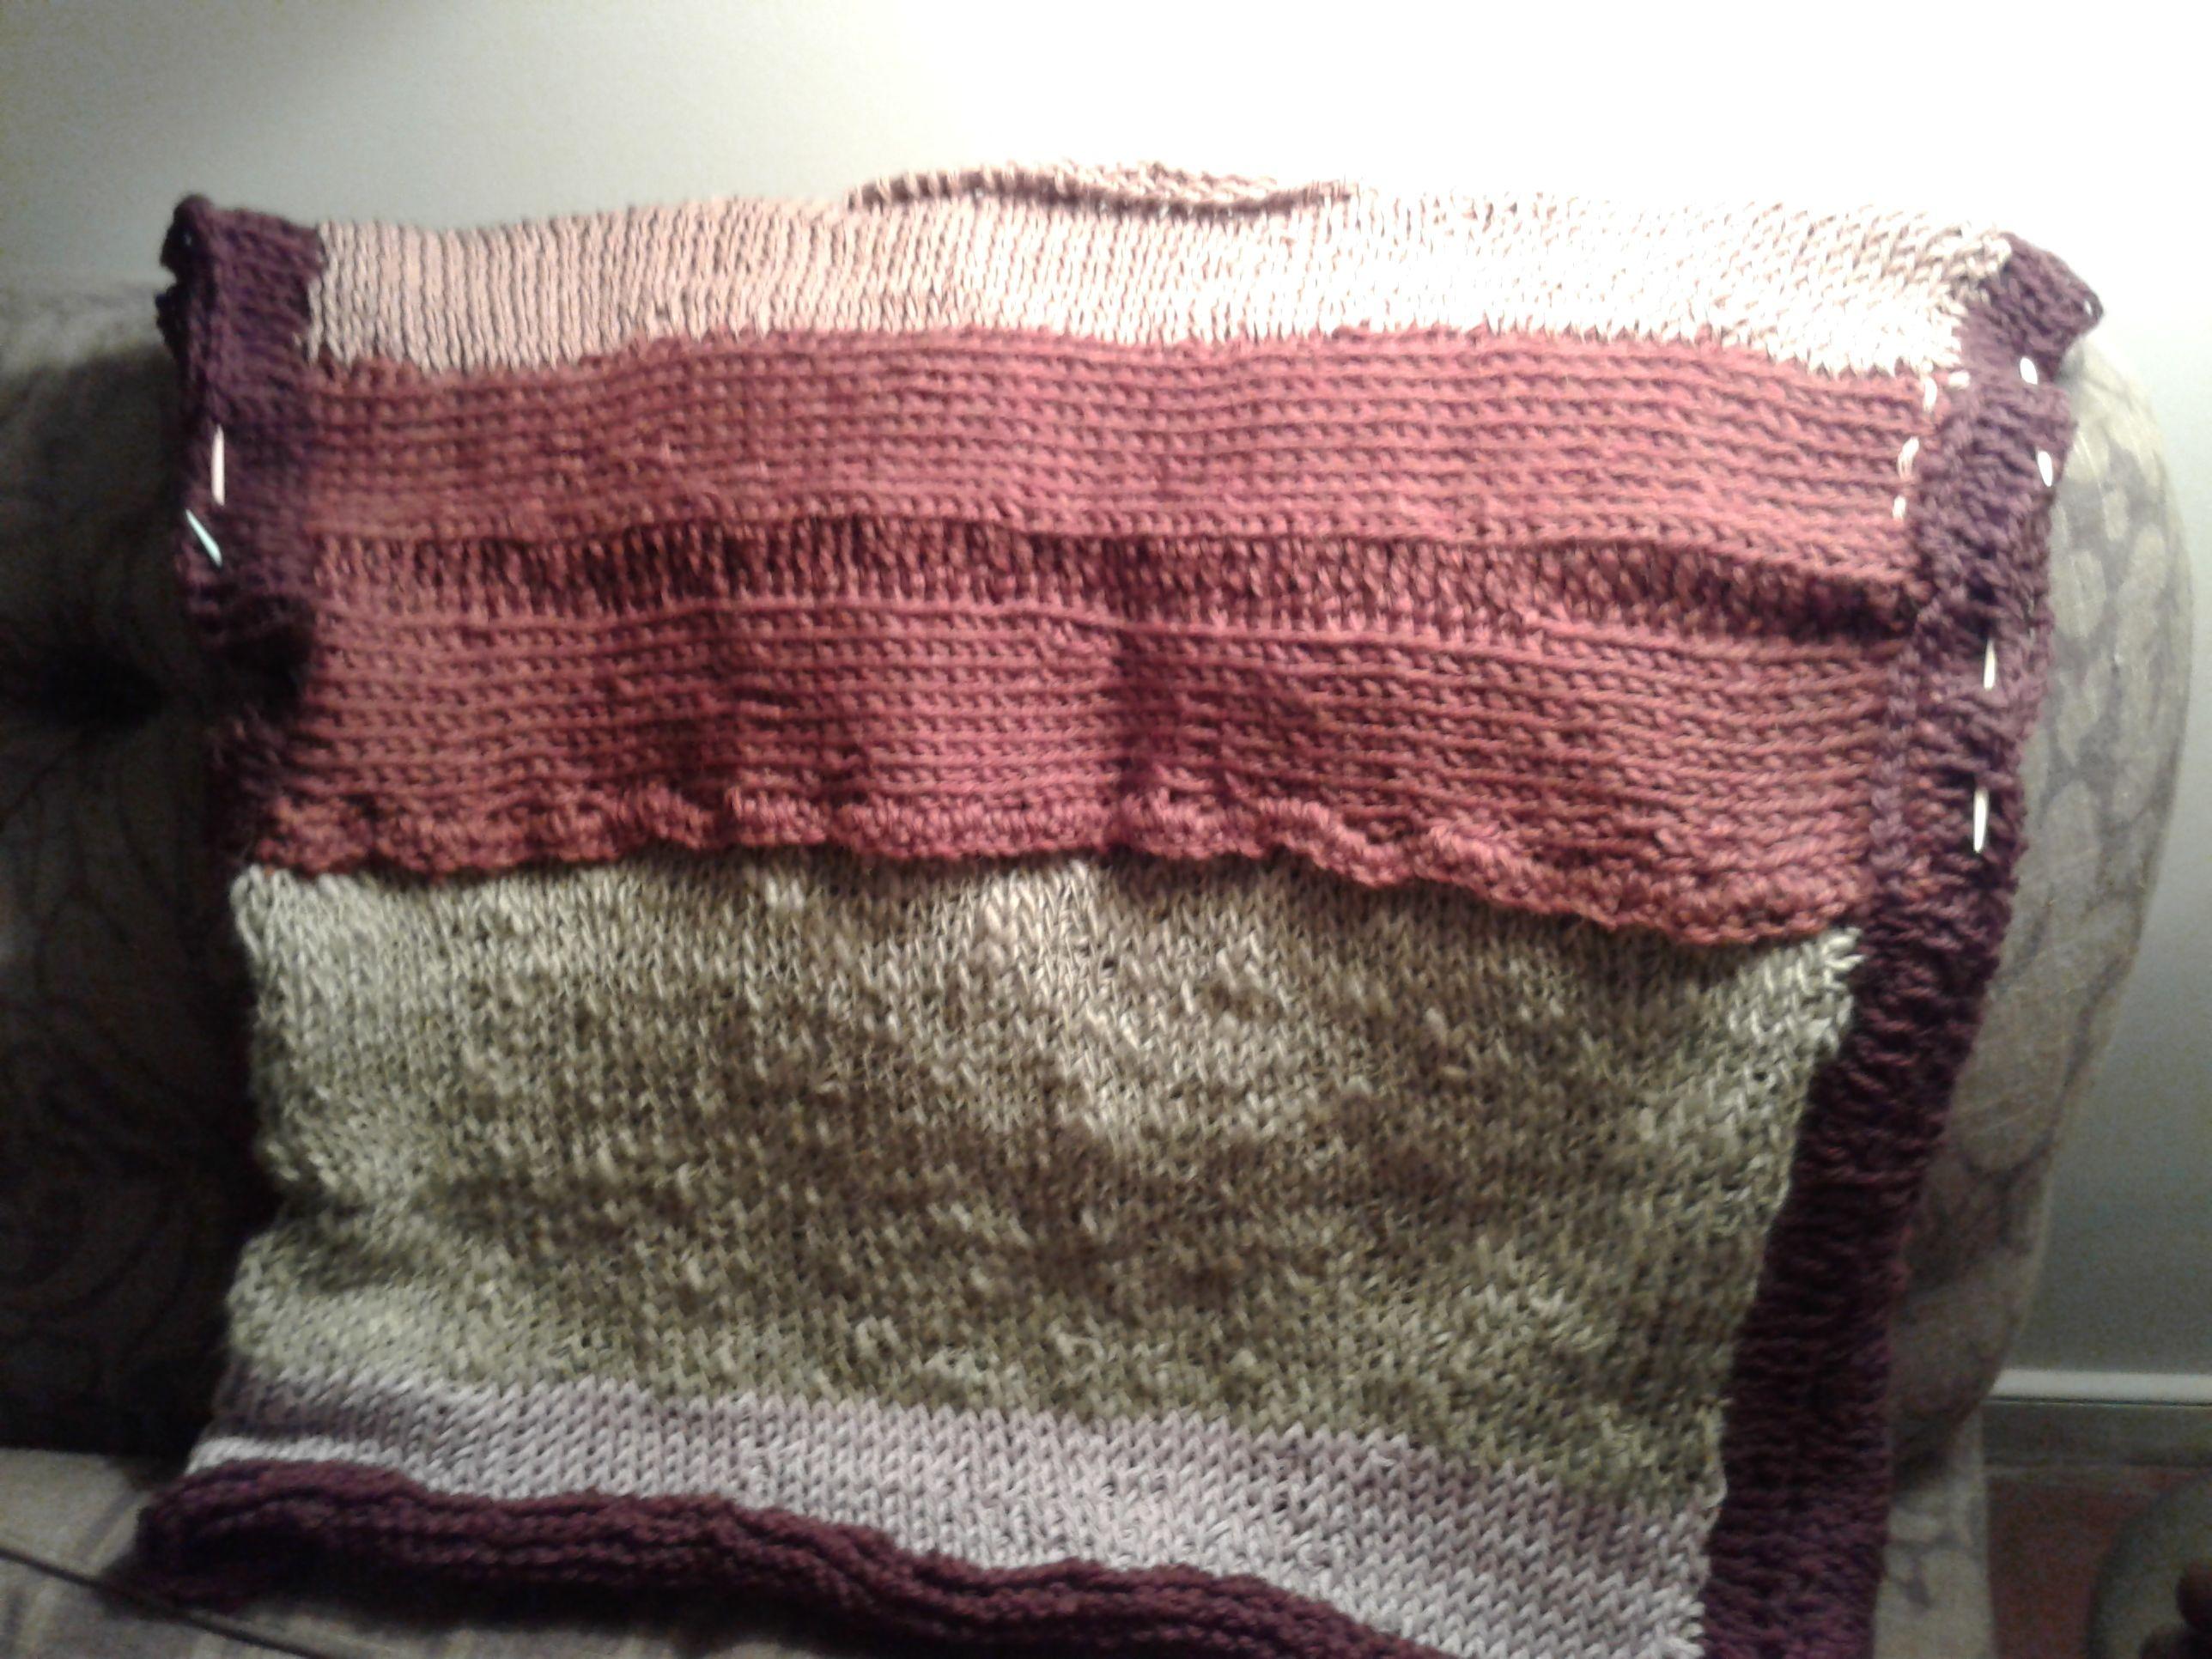 Silk + Wool + Cotton sweater nearing the finishing line